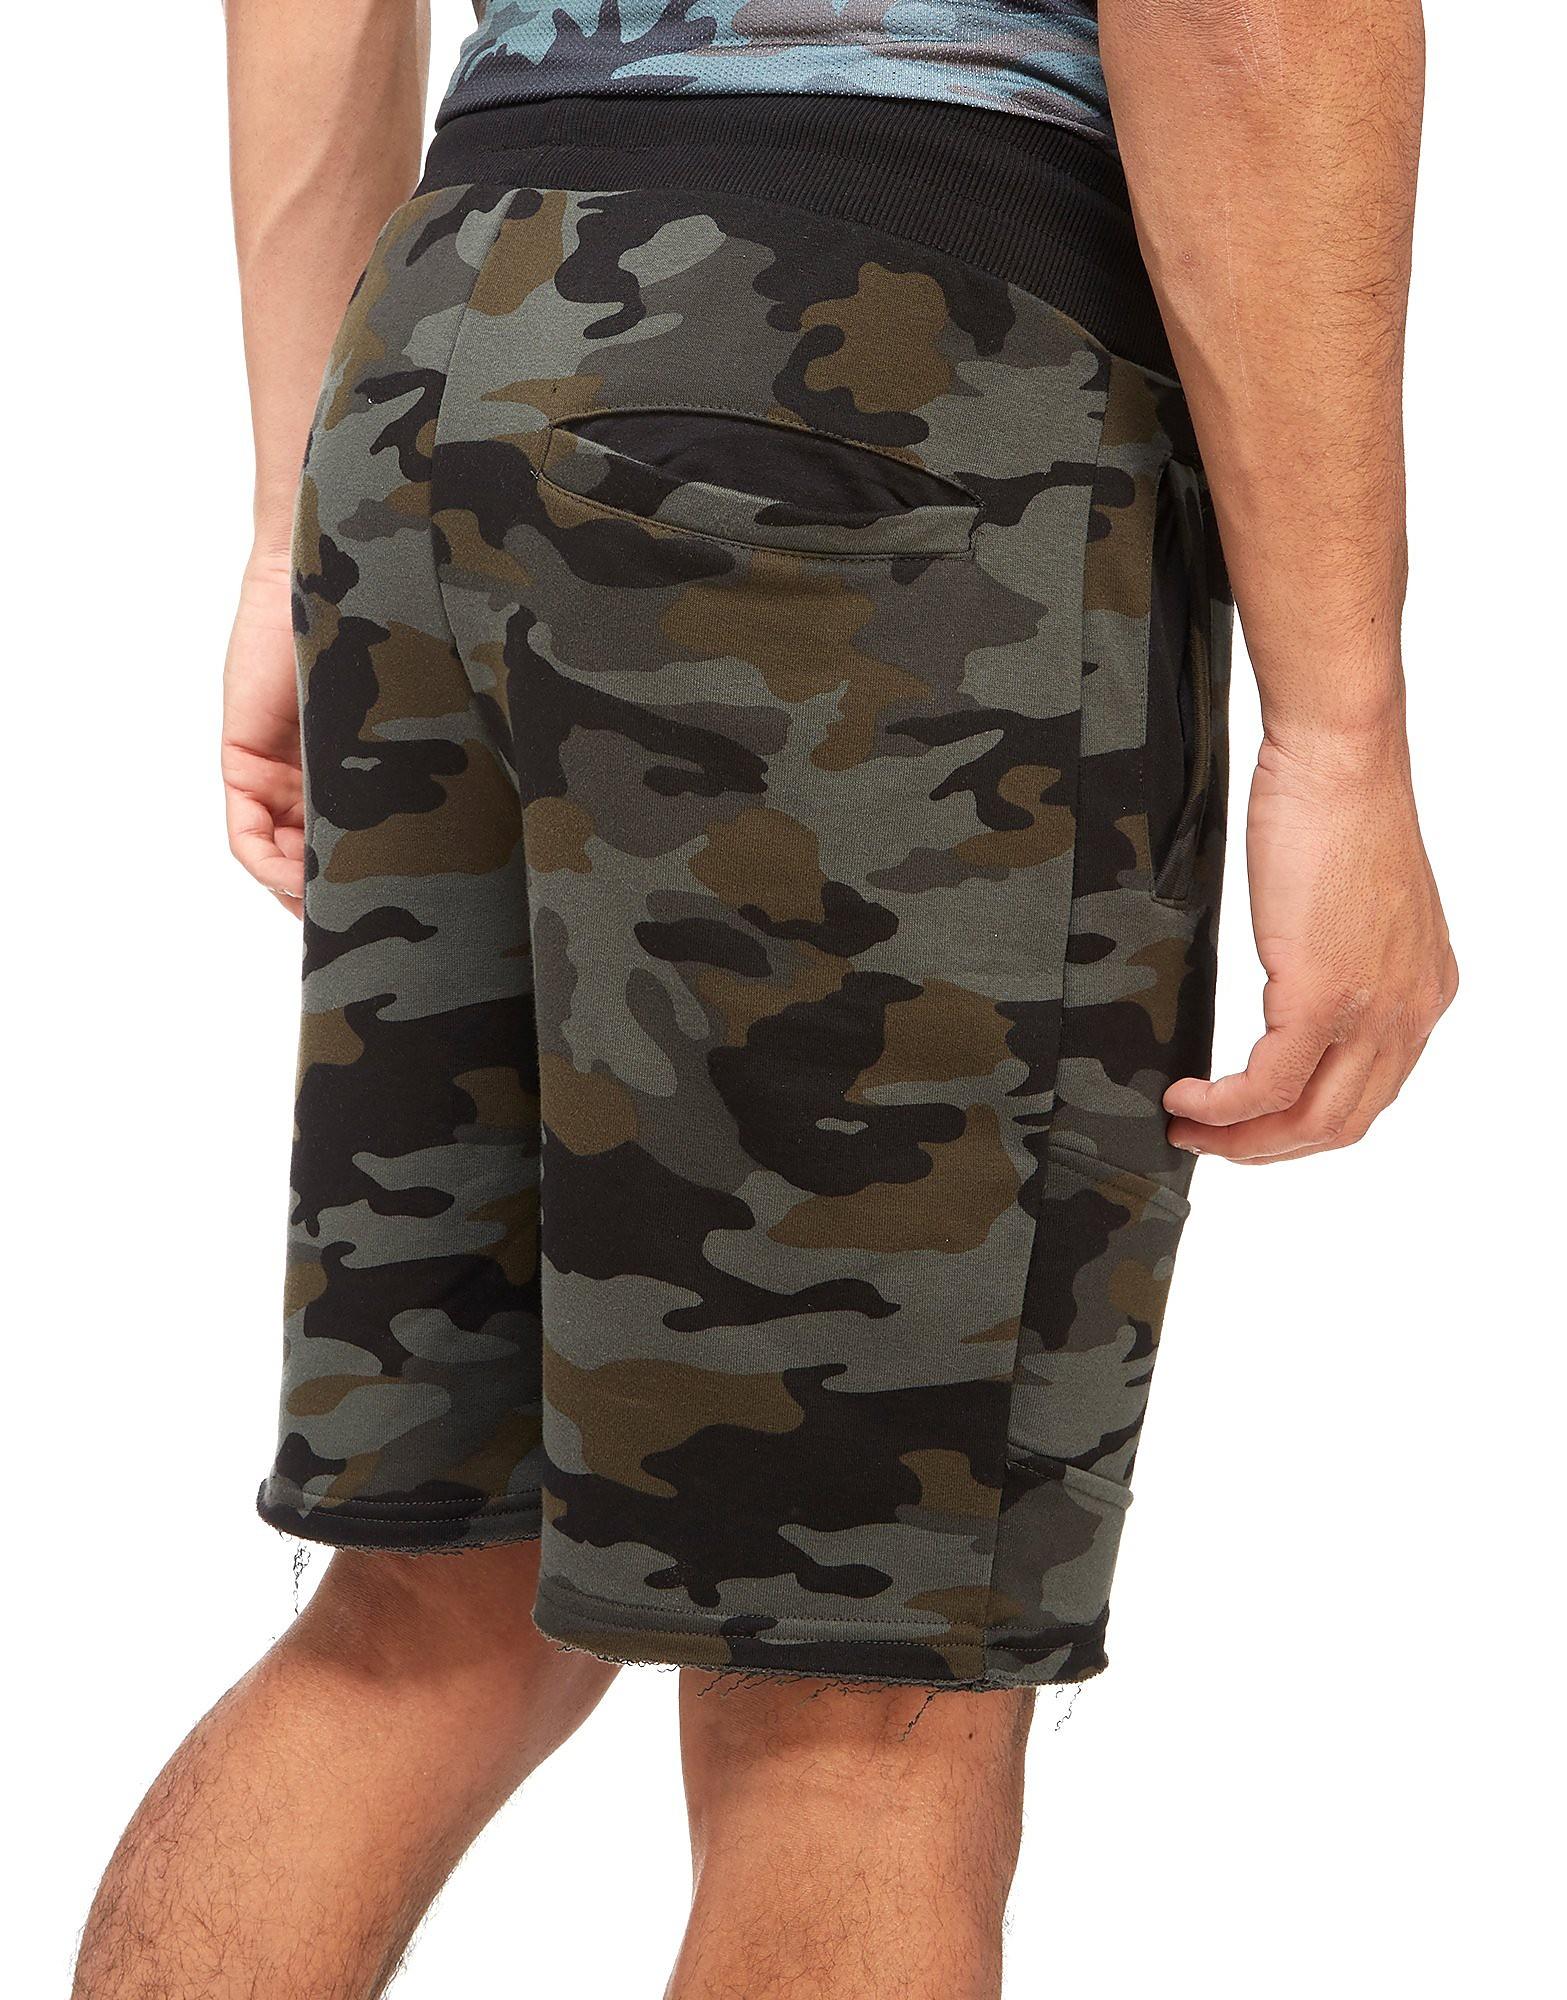 Supply & Demand Ammo Shorts